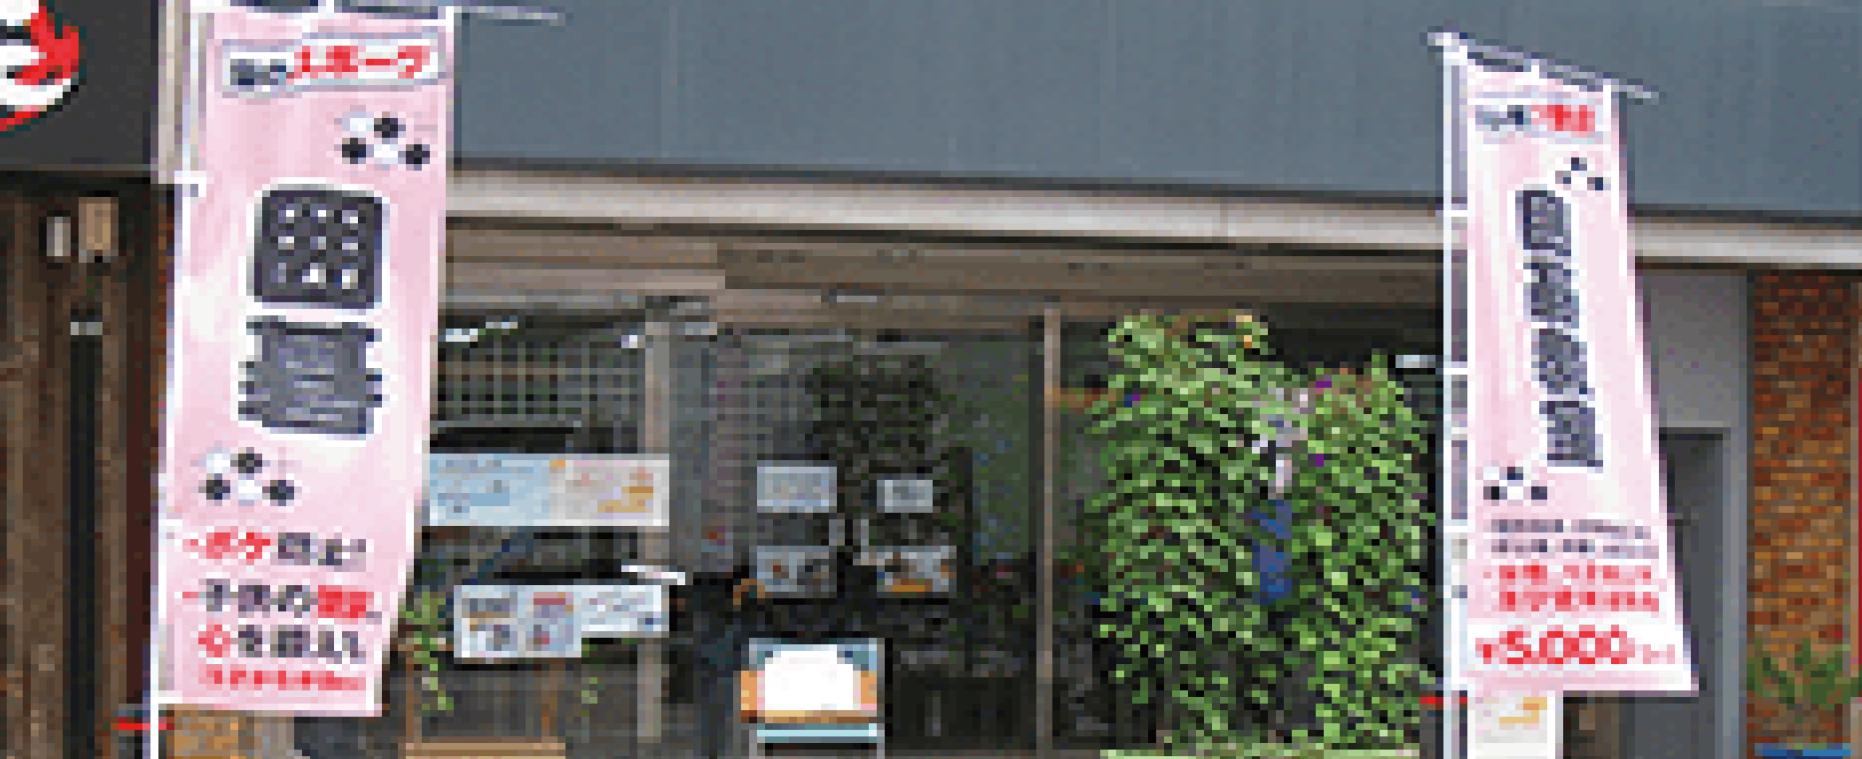 東京都 囲碁クラブ「旧・東海道」 戸高様